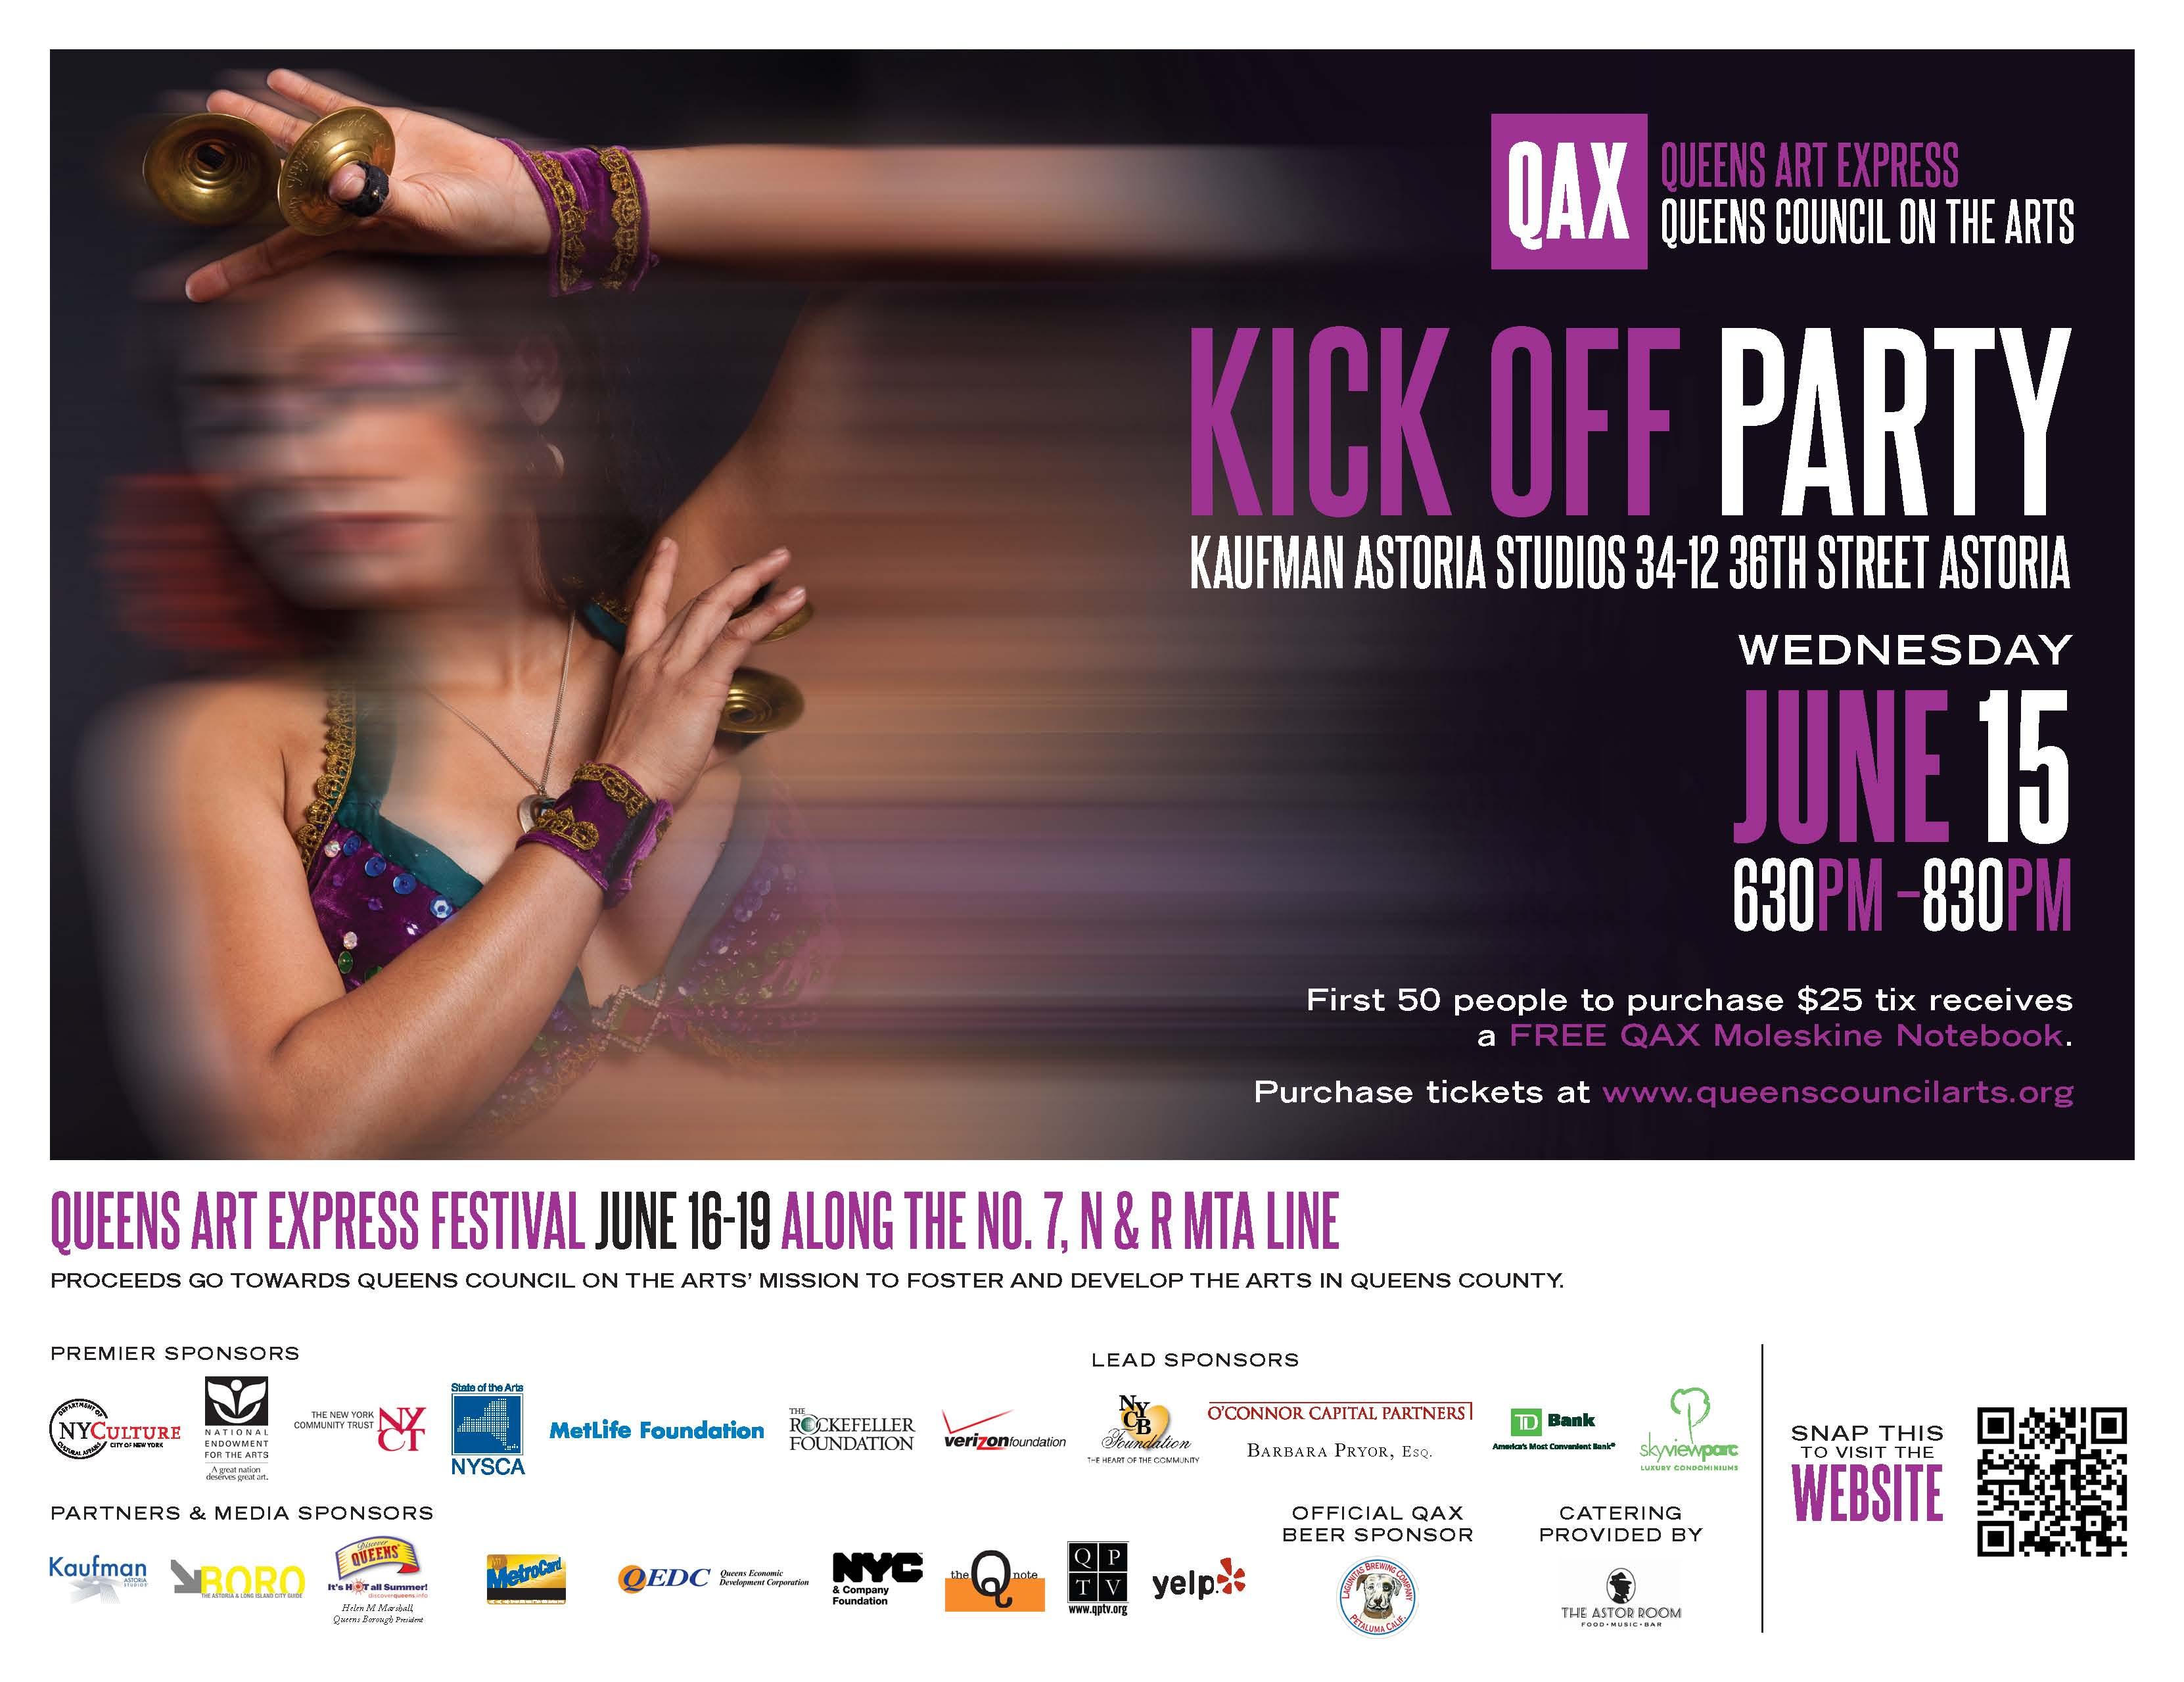 QAX Kick Off Party 6.15.11